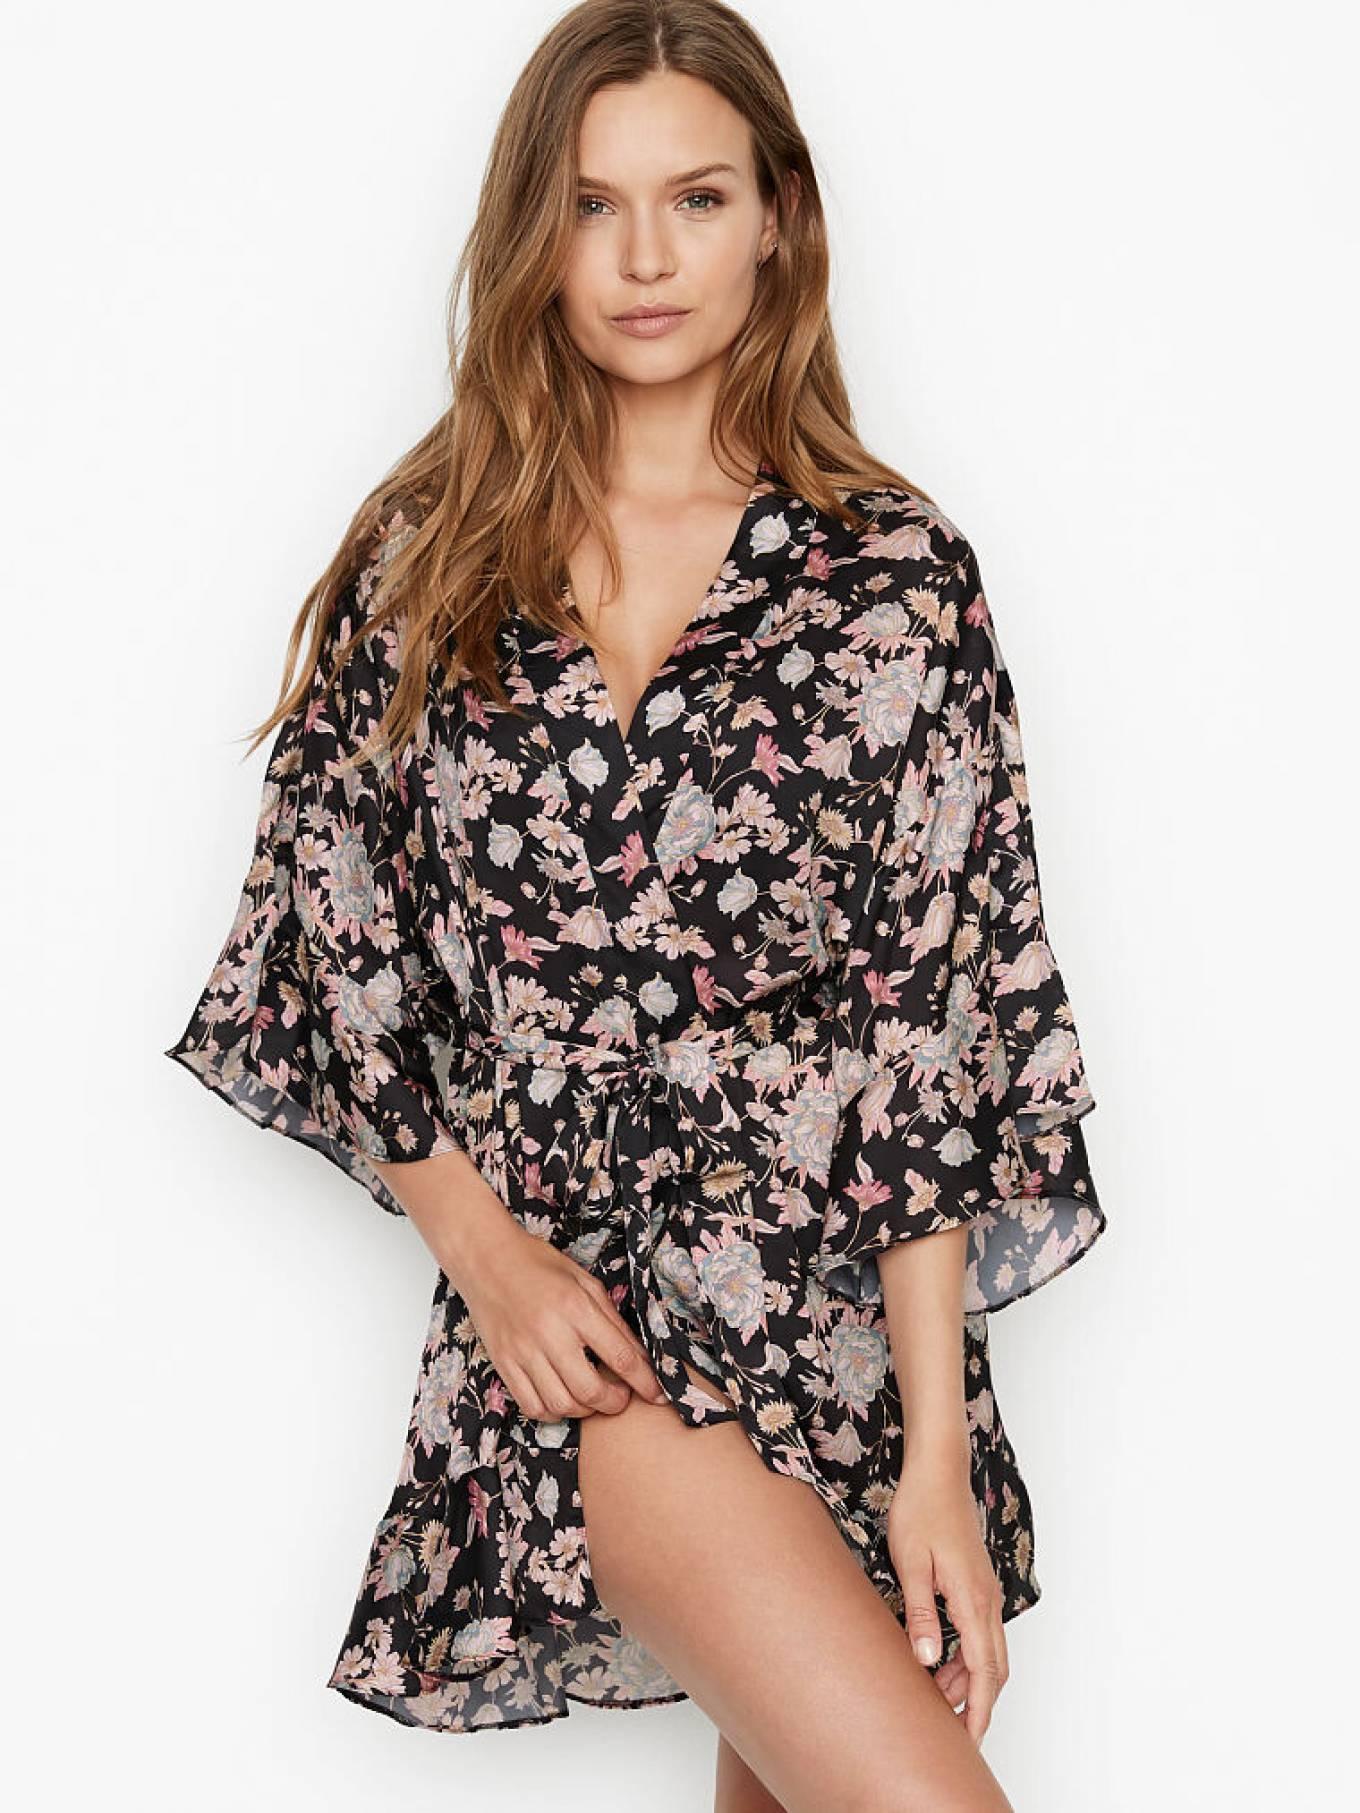 Josephine Skriver 2020 : Josephine Skriver – Victorias Secret – September 2020-07